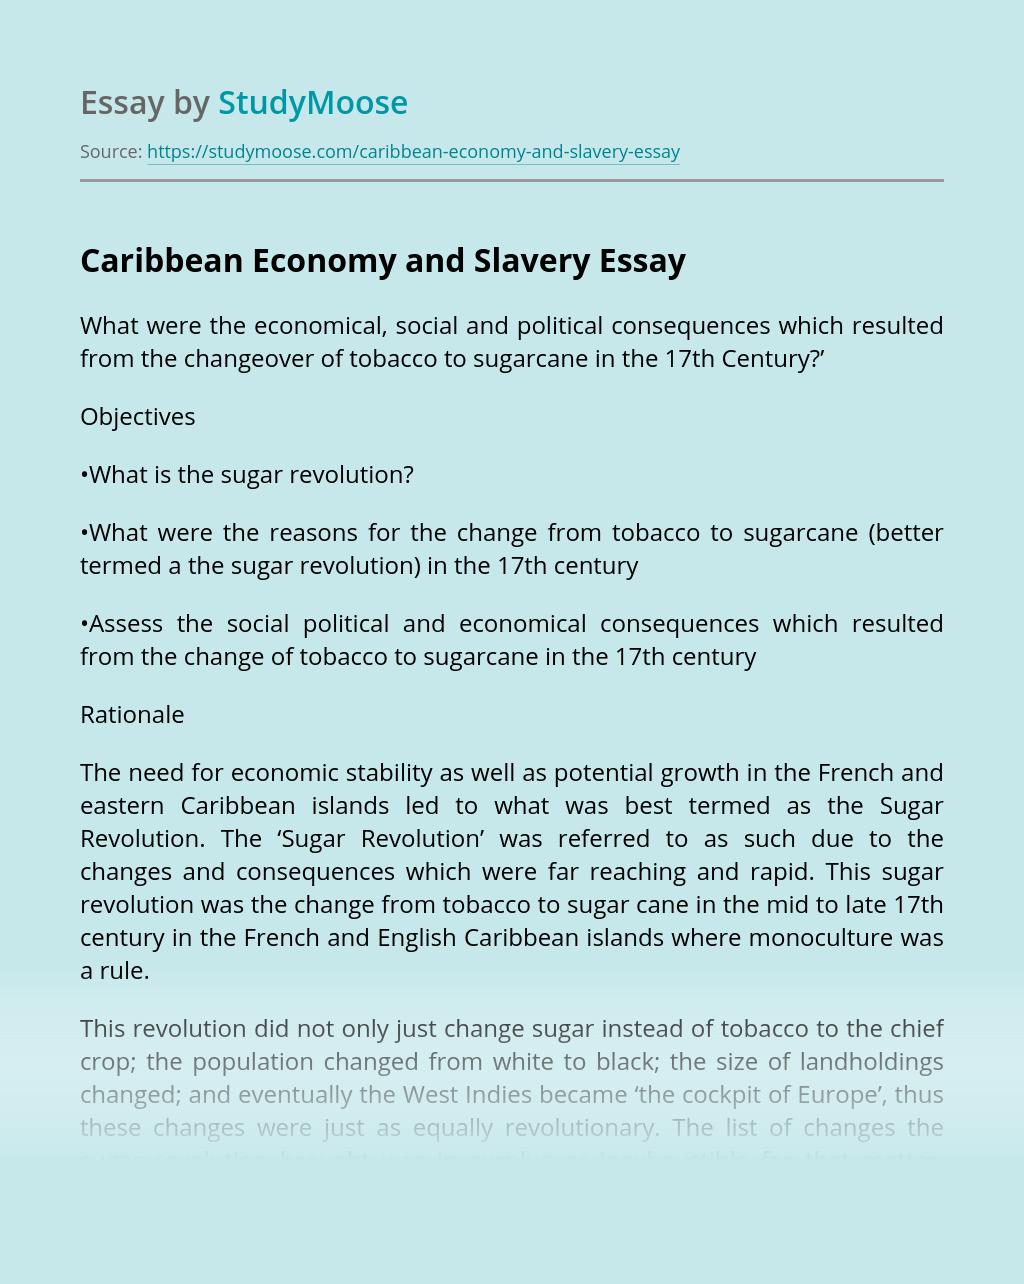 Caribbean Economy and Slavery